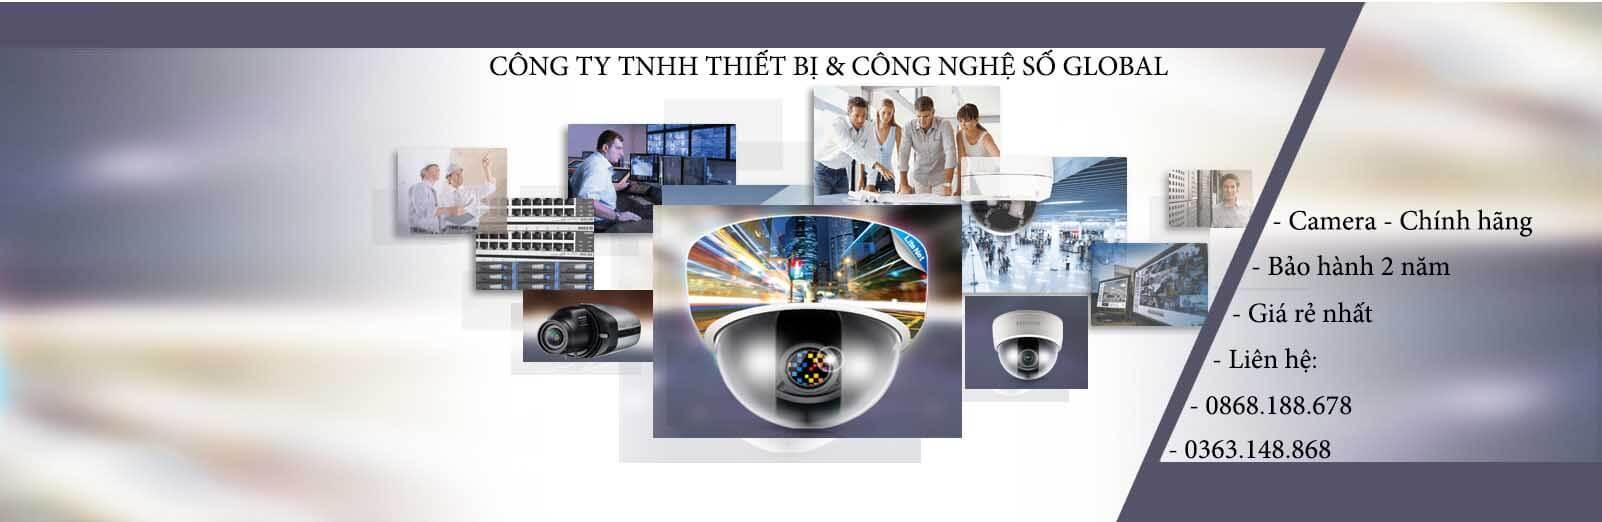 lắp đặt camera giám sát an ninh